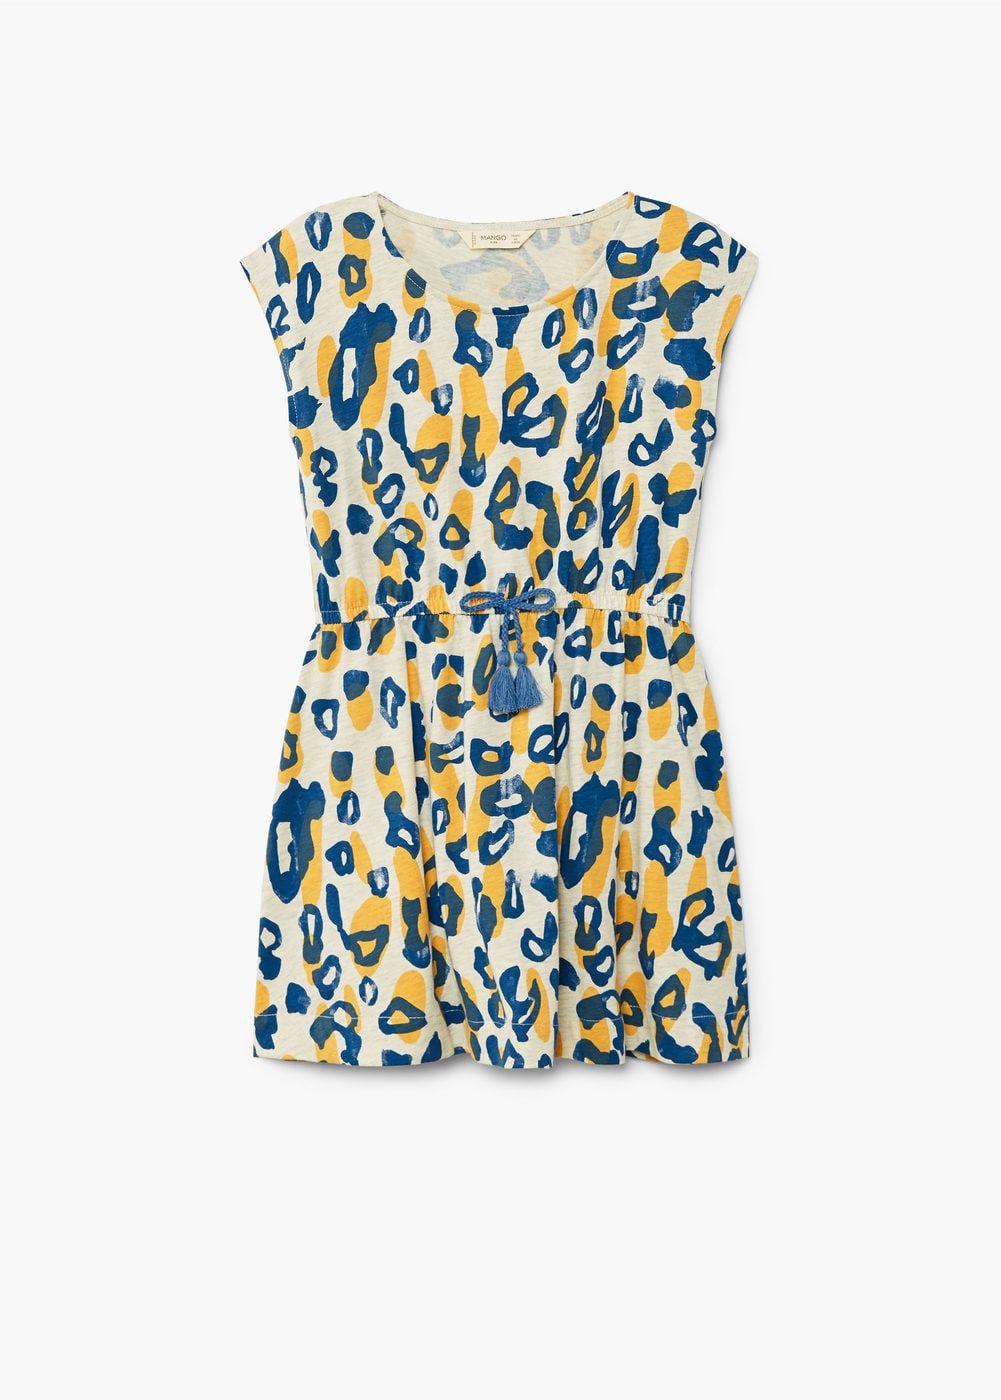 08272f4f9631 Flared design Cotton fabric Animal print Elastic waist with adjustable  drawstring Round neck Sleeveless